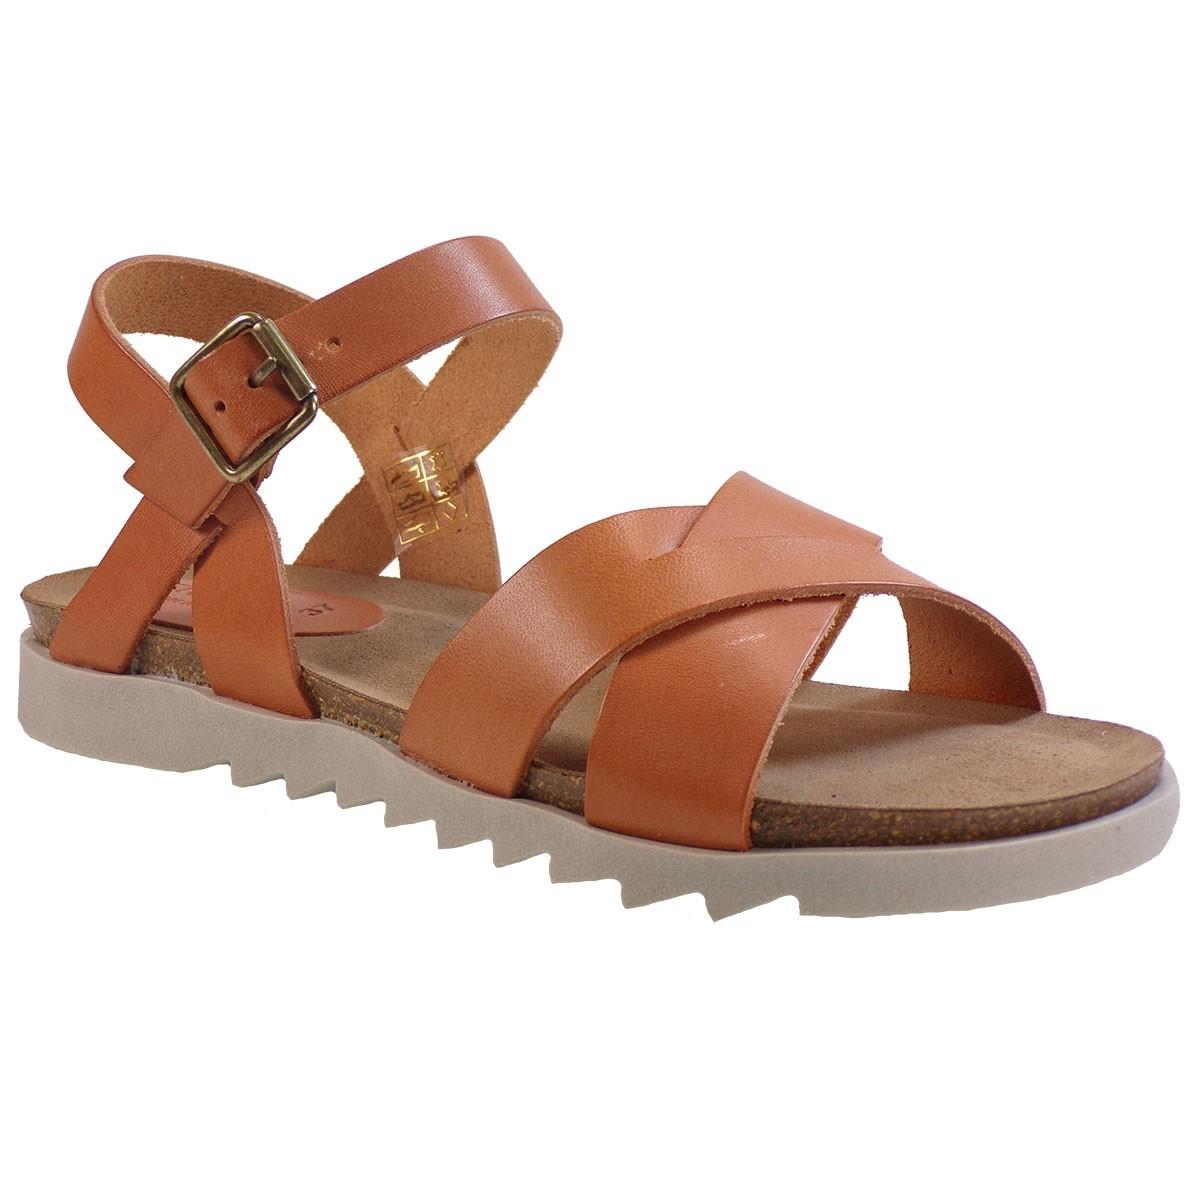 Fluchos Femme Γυναικεία Παπούτσια Πέδιλα F0473 Ταμπά